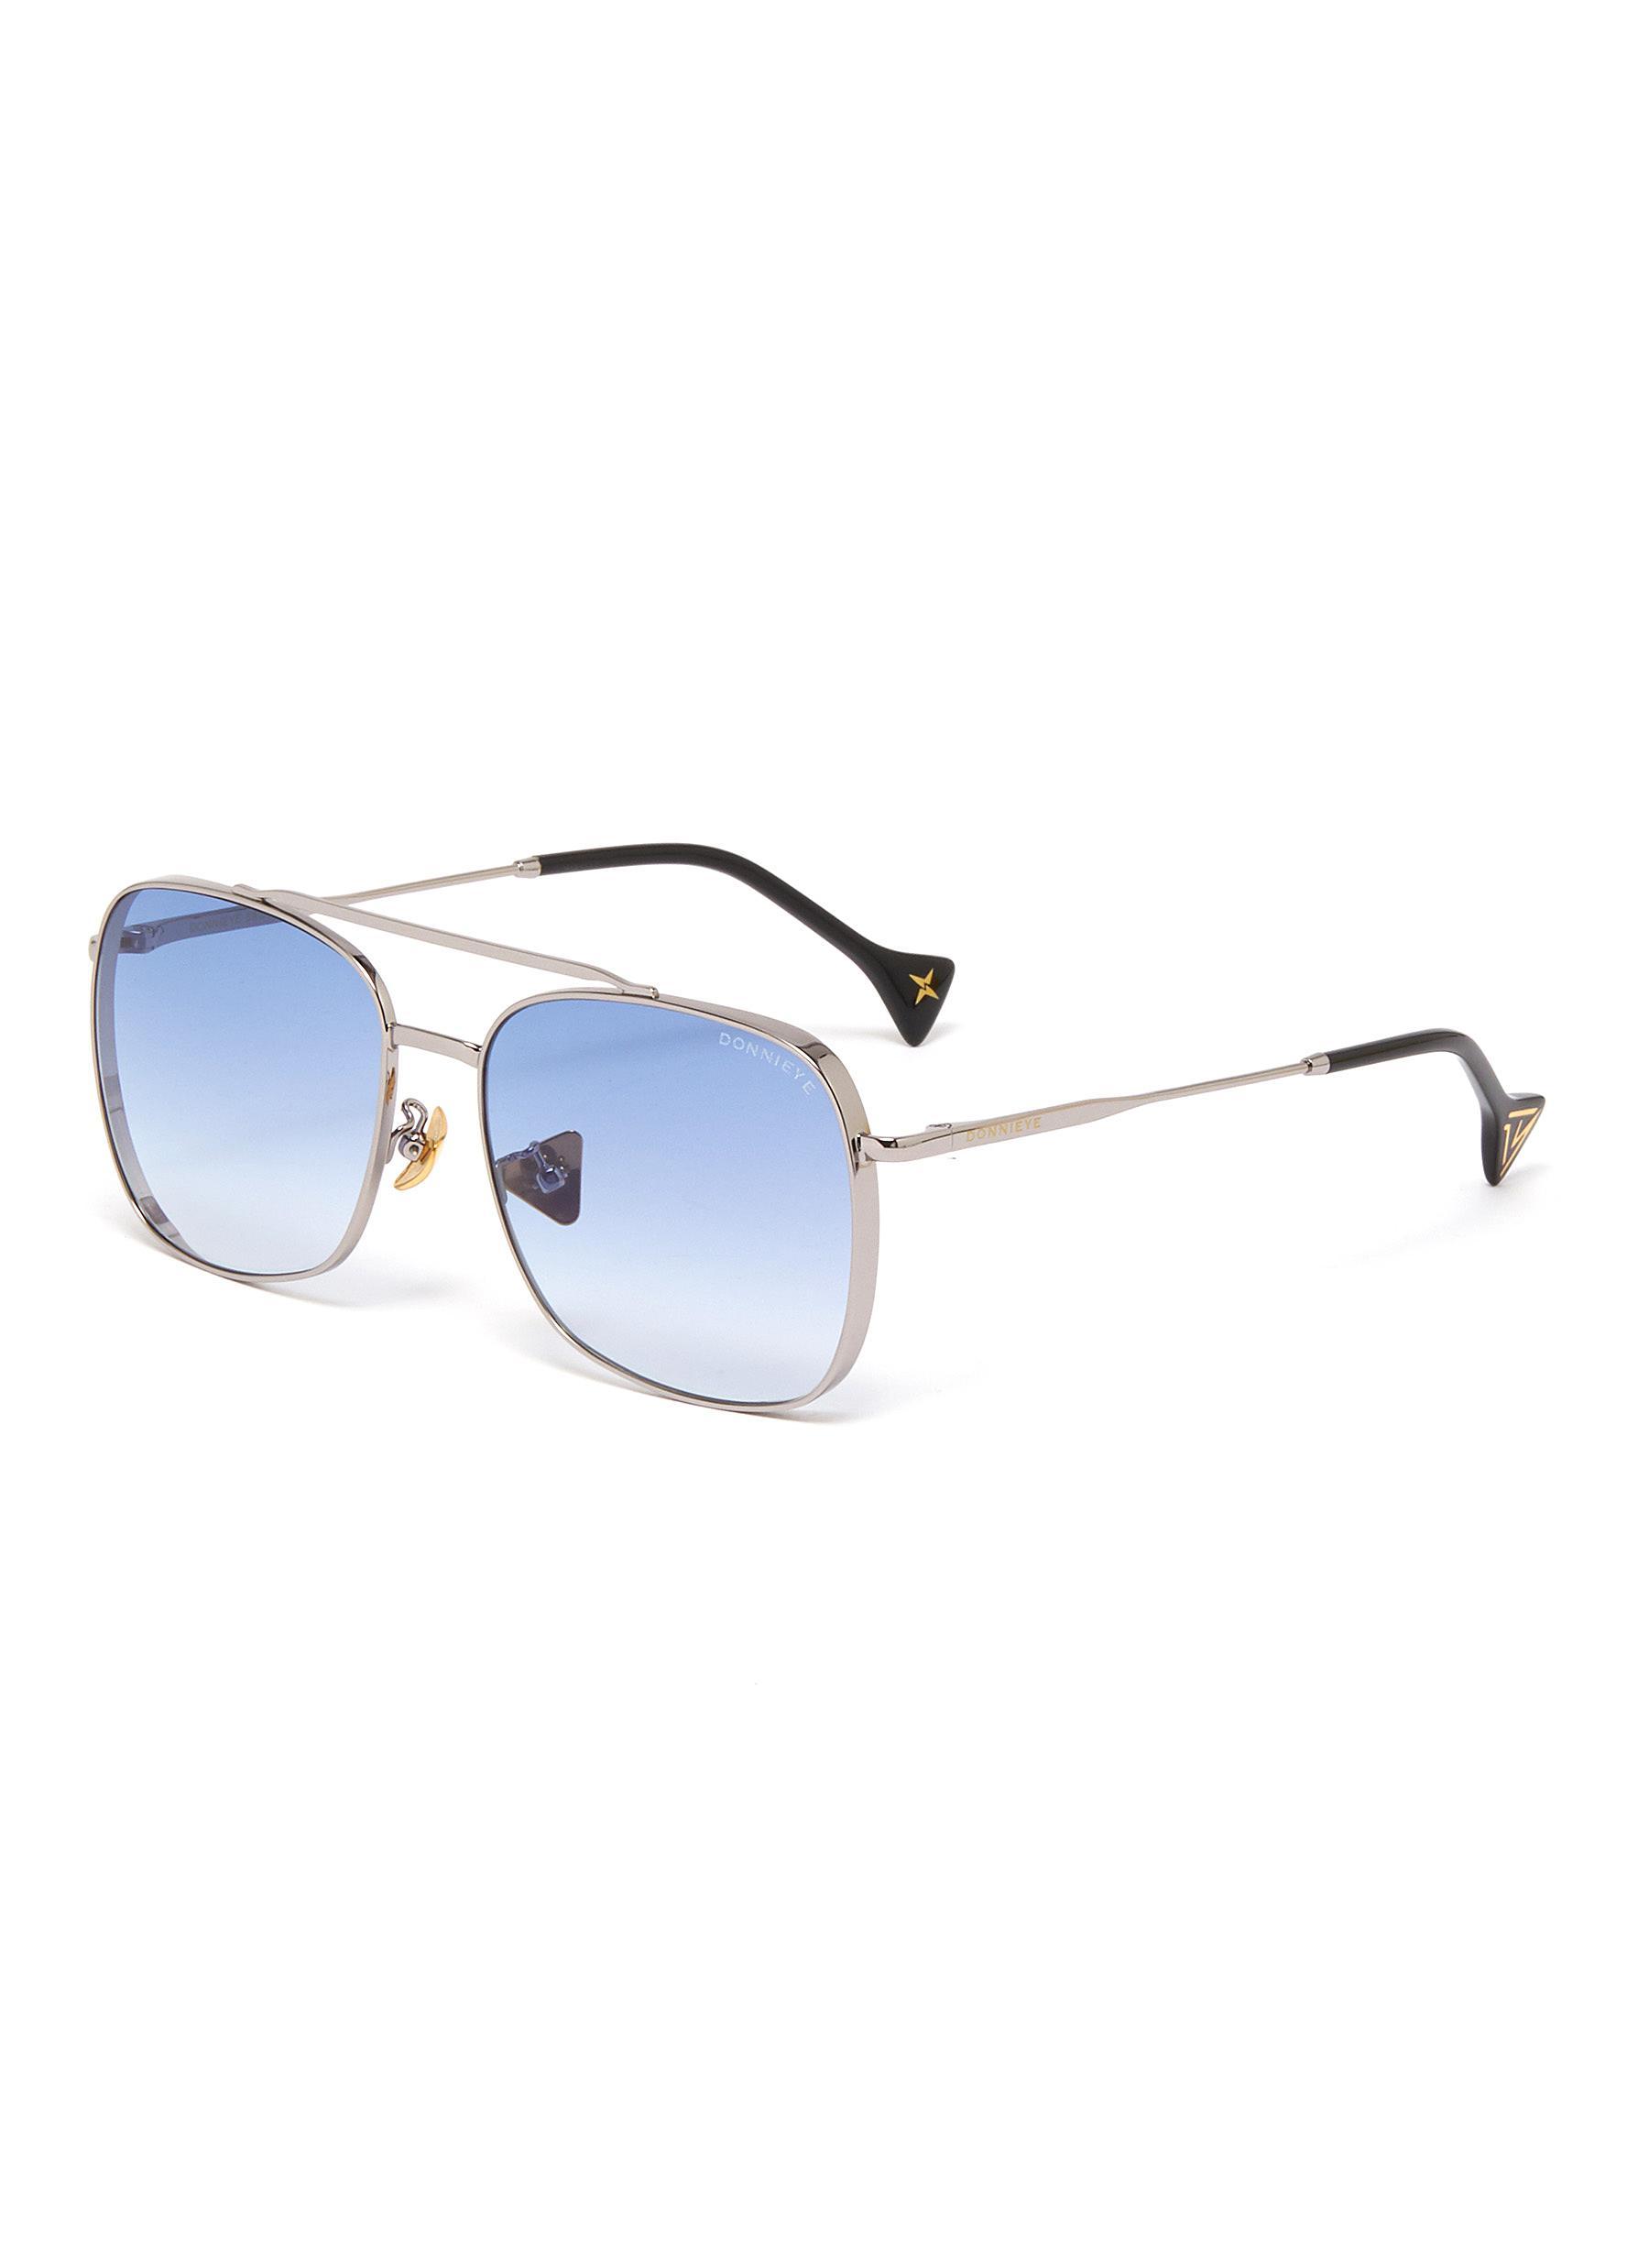 'Fearless' square metal frame aviator sunglasses